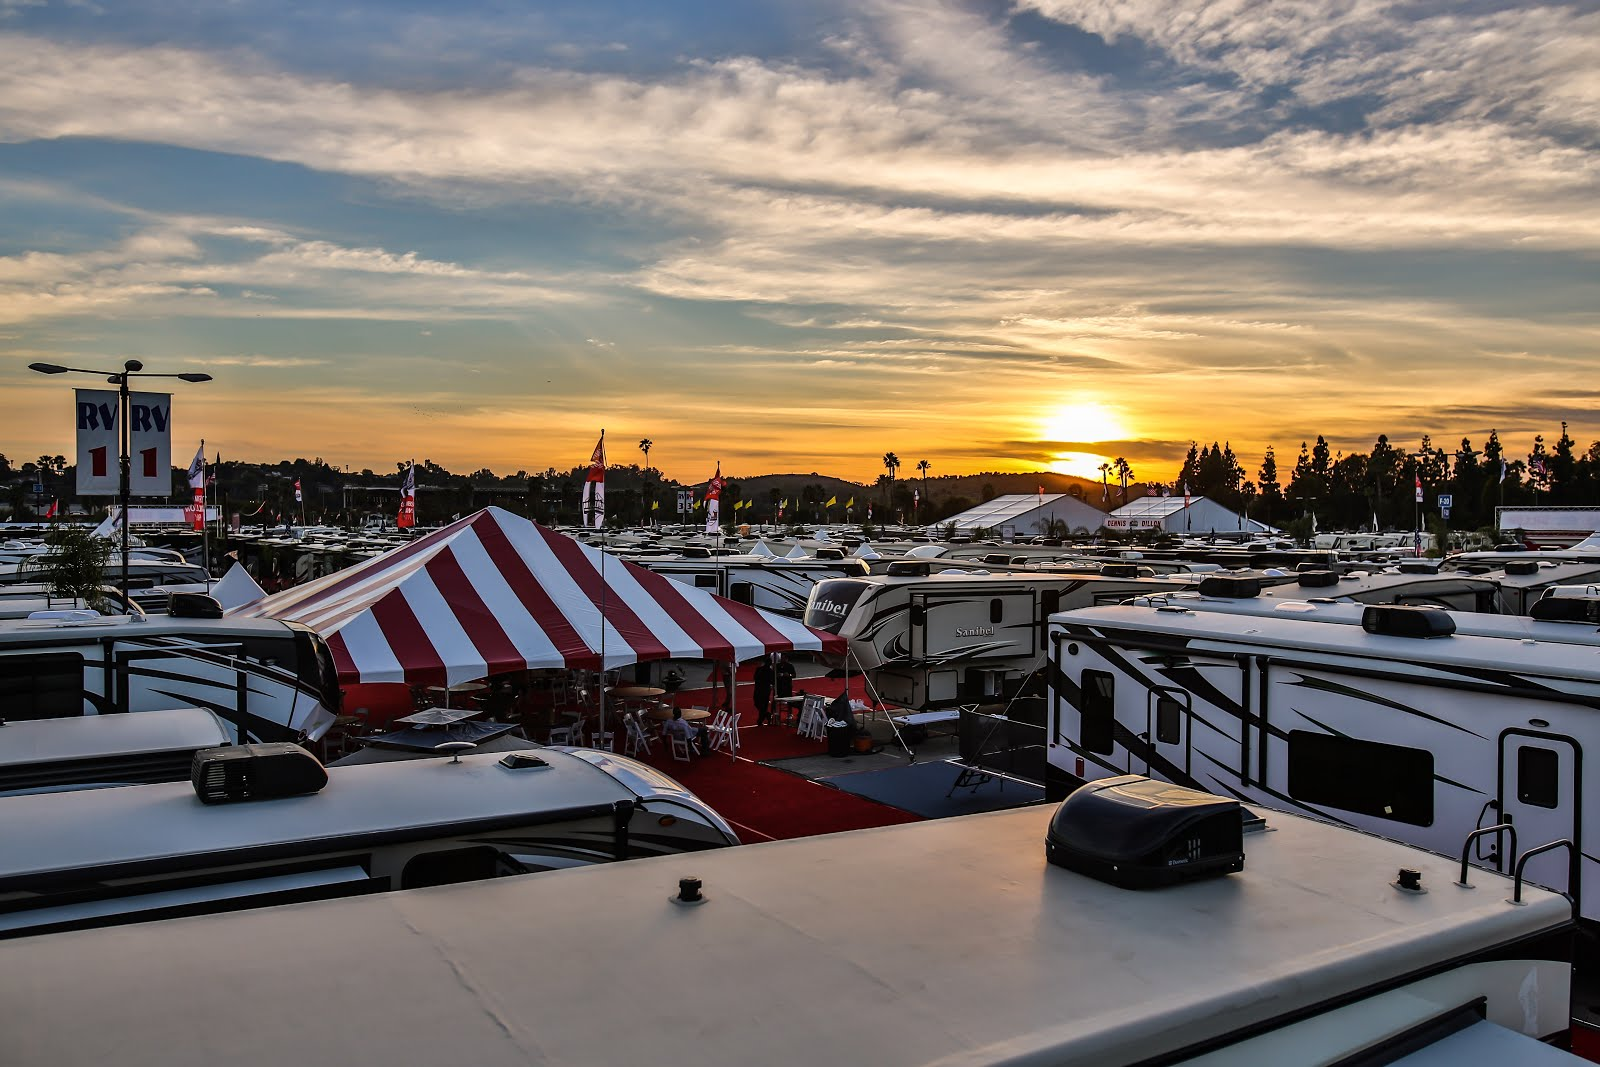 The 64th annual California RV Show rolls back in Mark